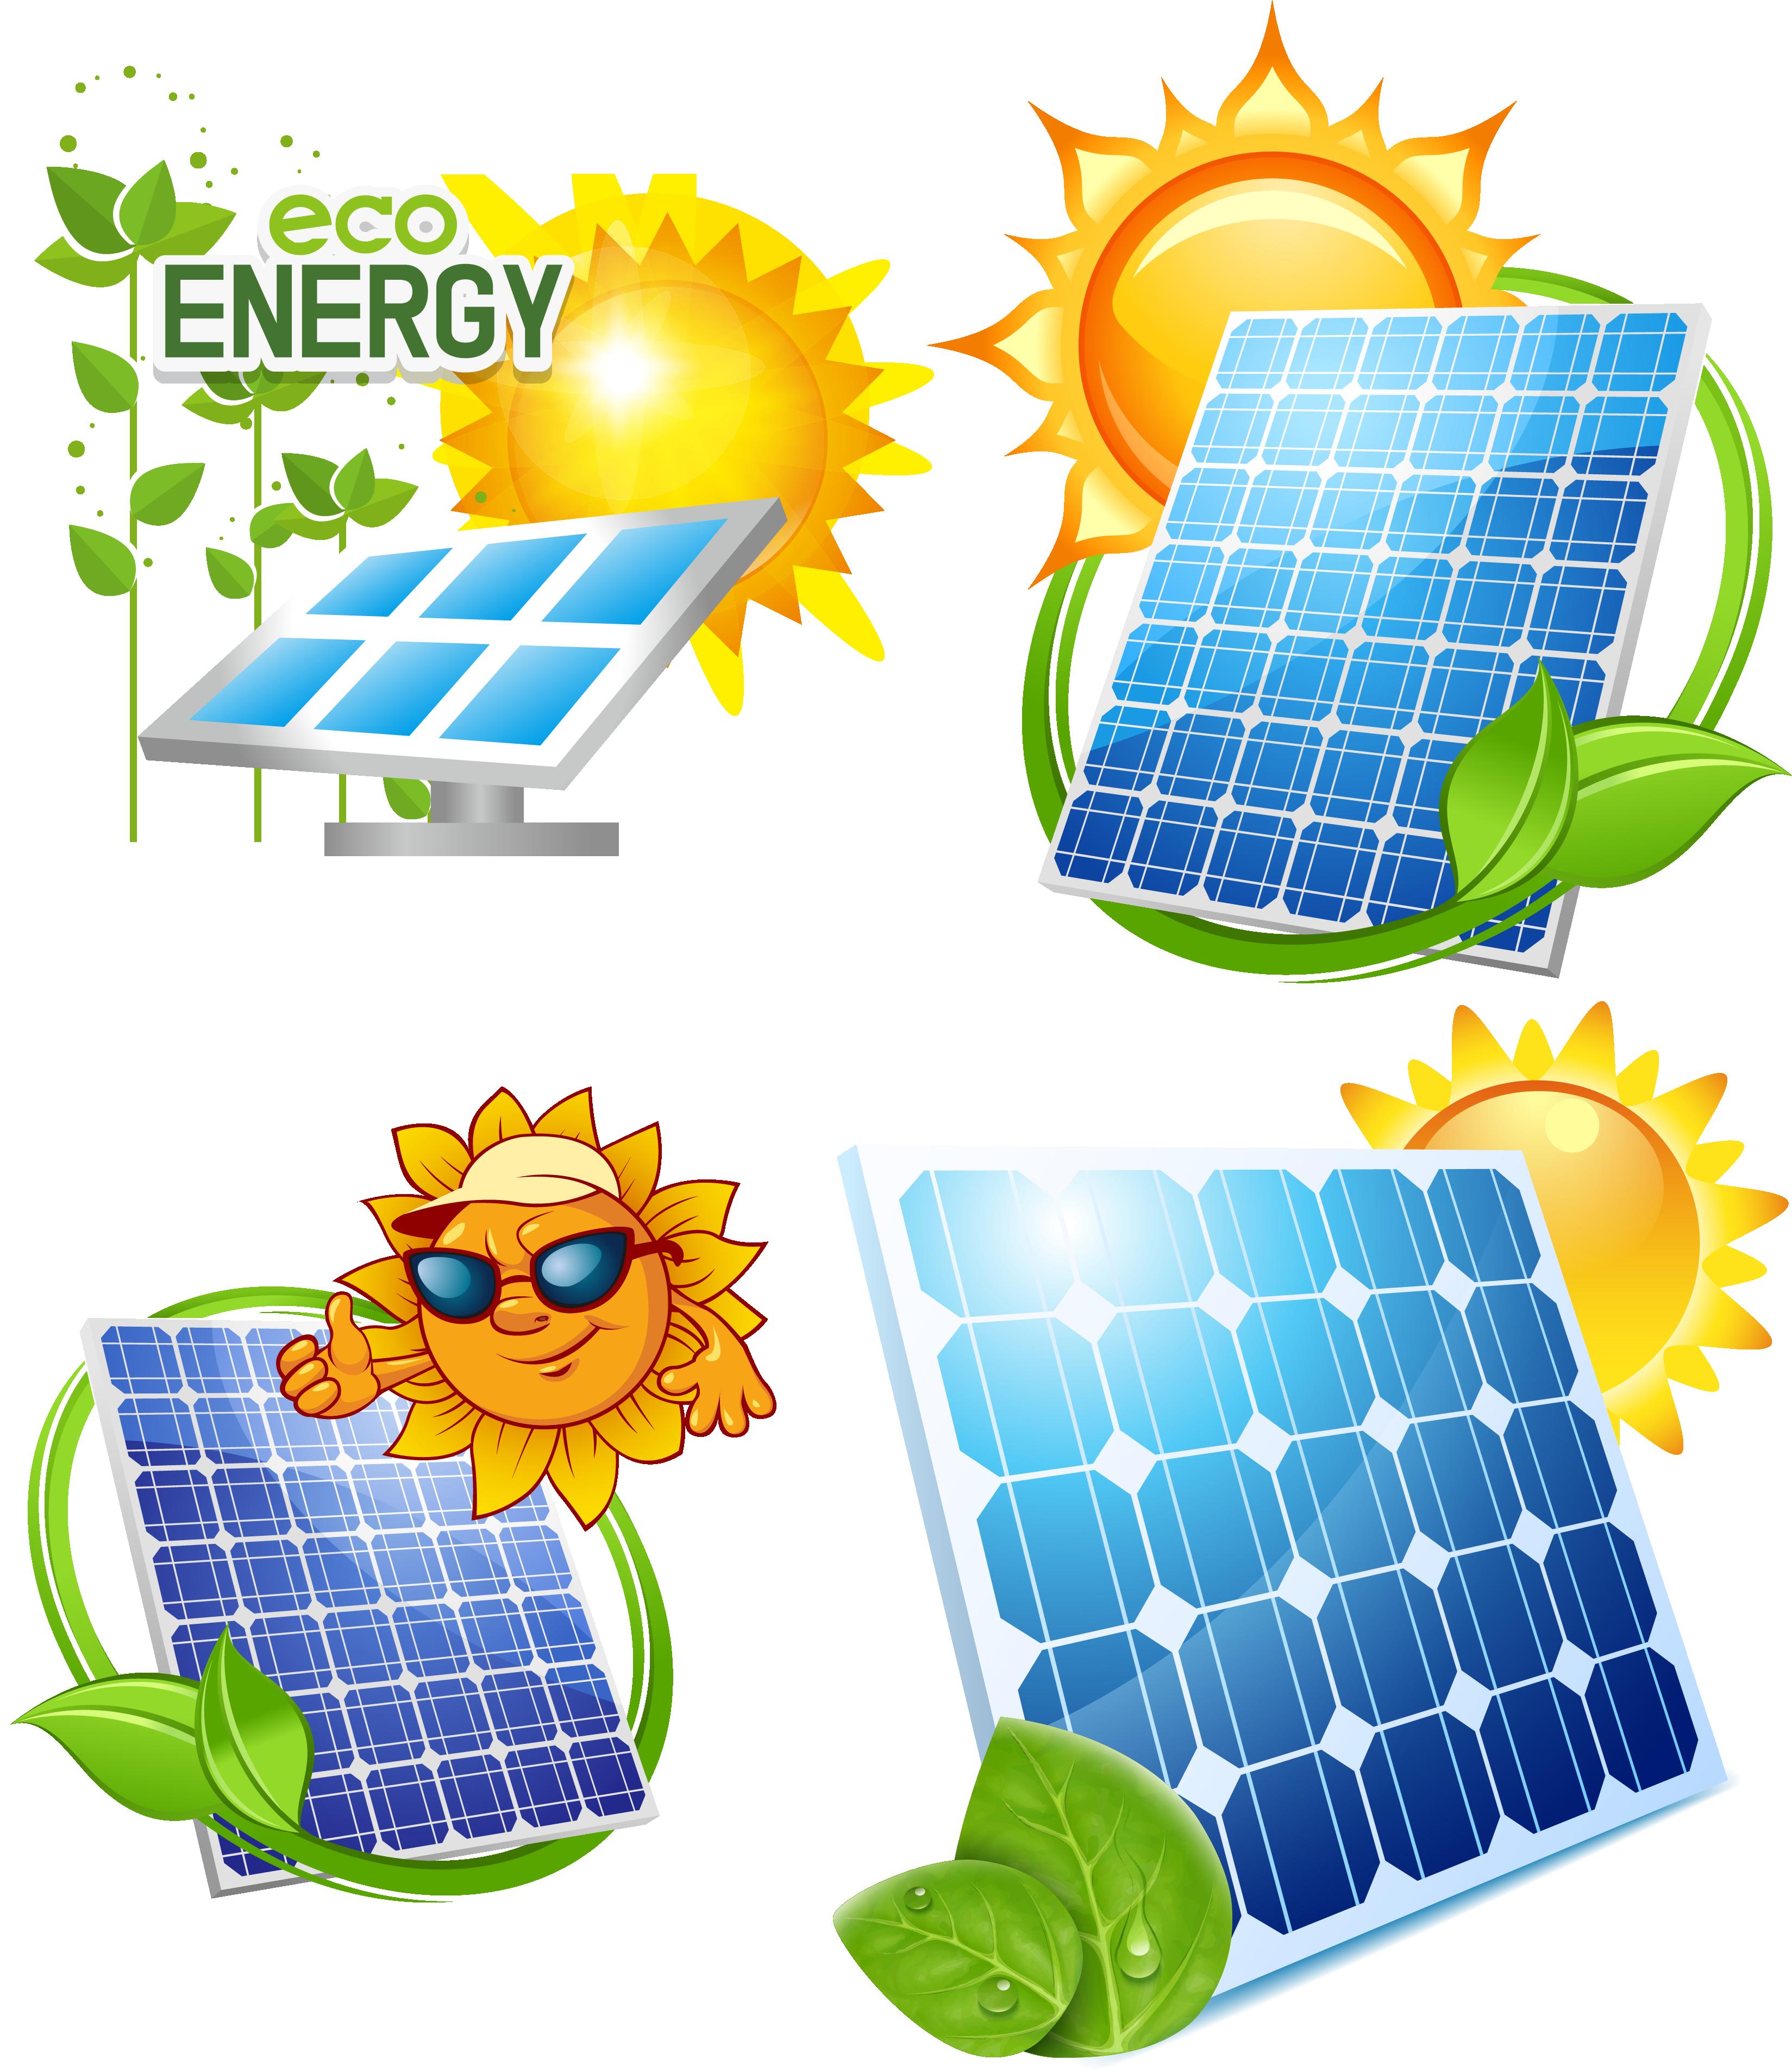 Energy clipart solar power. Panel photovoltaics energysaving design